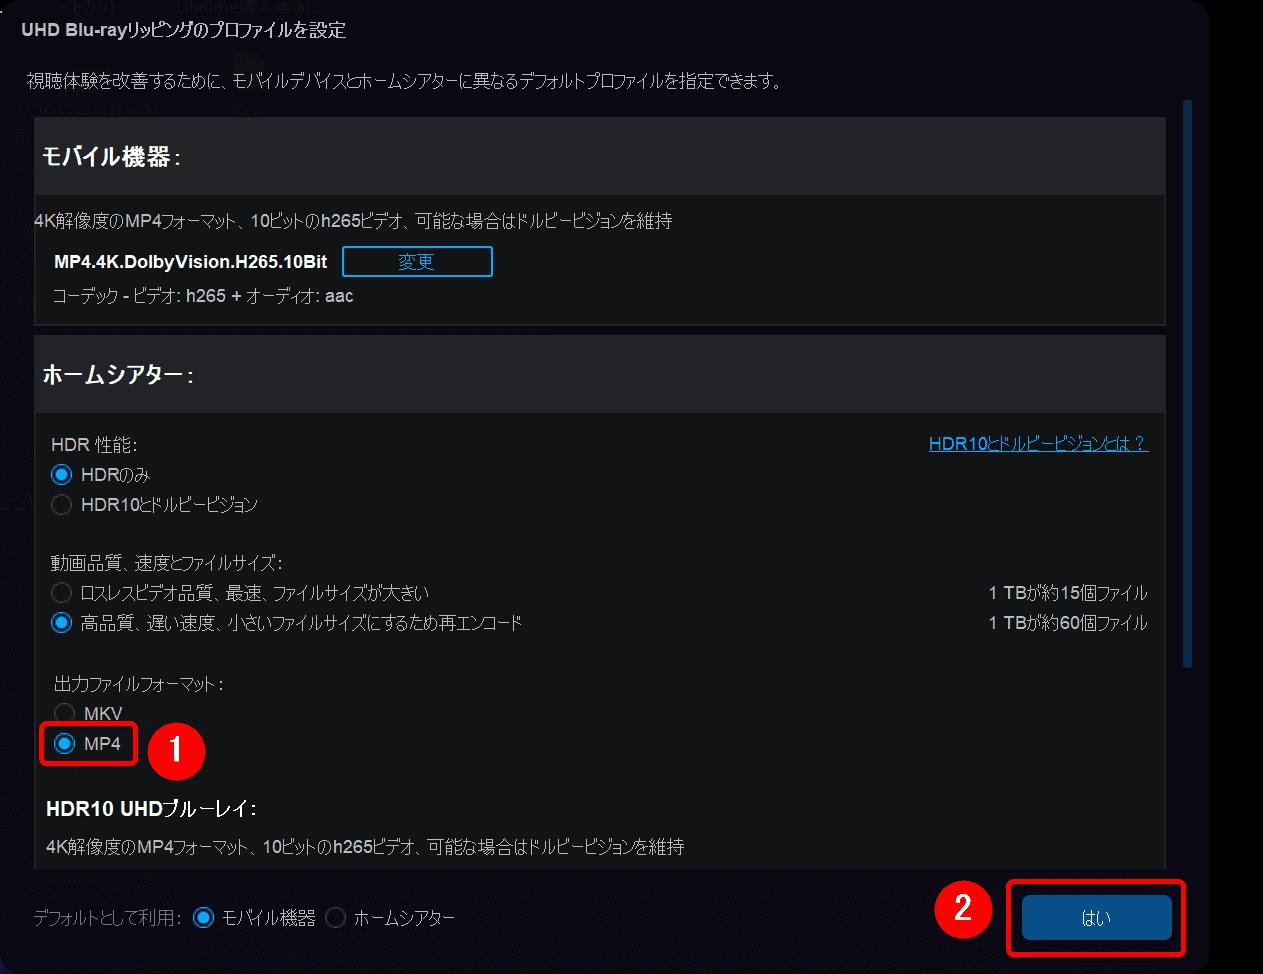 DVDFab12 4K UHDブルーレイのコピー方法|無料でコピーガード解除して4K UHDブルーレイをパソコンに永久保存する方法|ISOファイルをiPhoneに適した形式に変換する:はじめに「UHD Blu-rayリッピングのプロファイル設定」画面が表示されるので、「出力ファイルフォーマット」をMP4に指定して「はい」を選択しましょう。